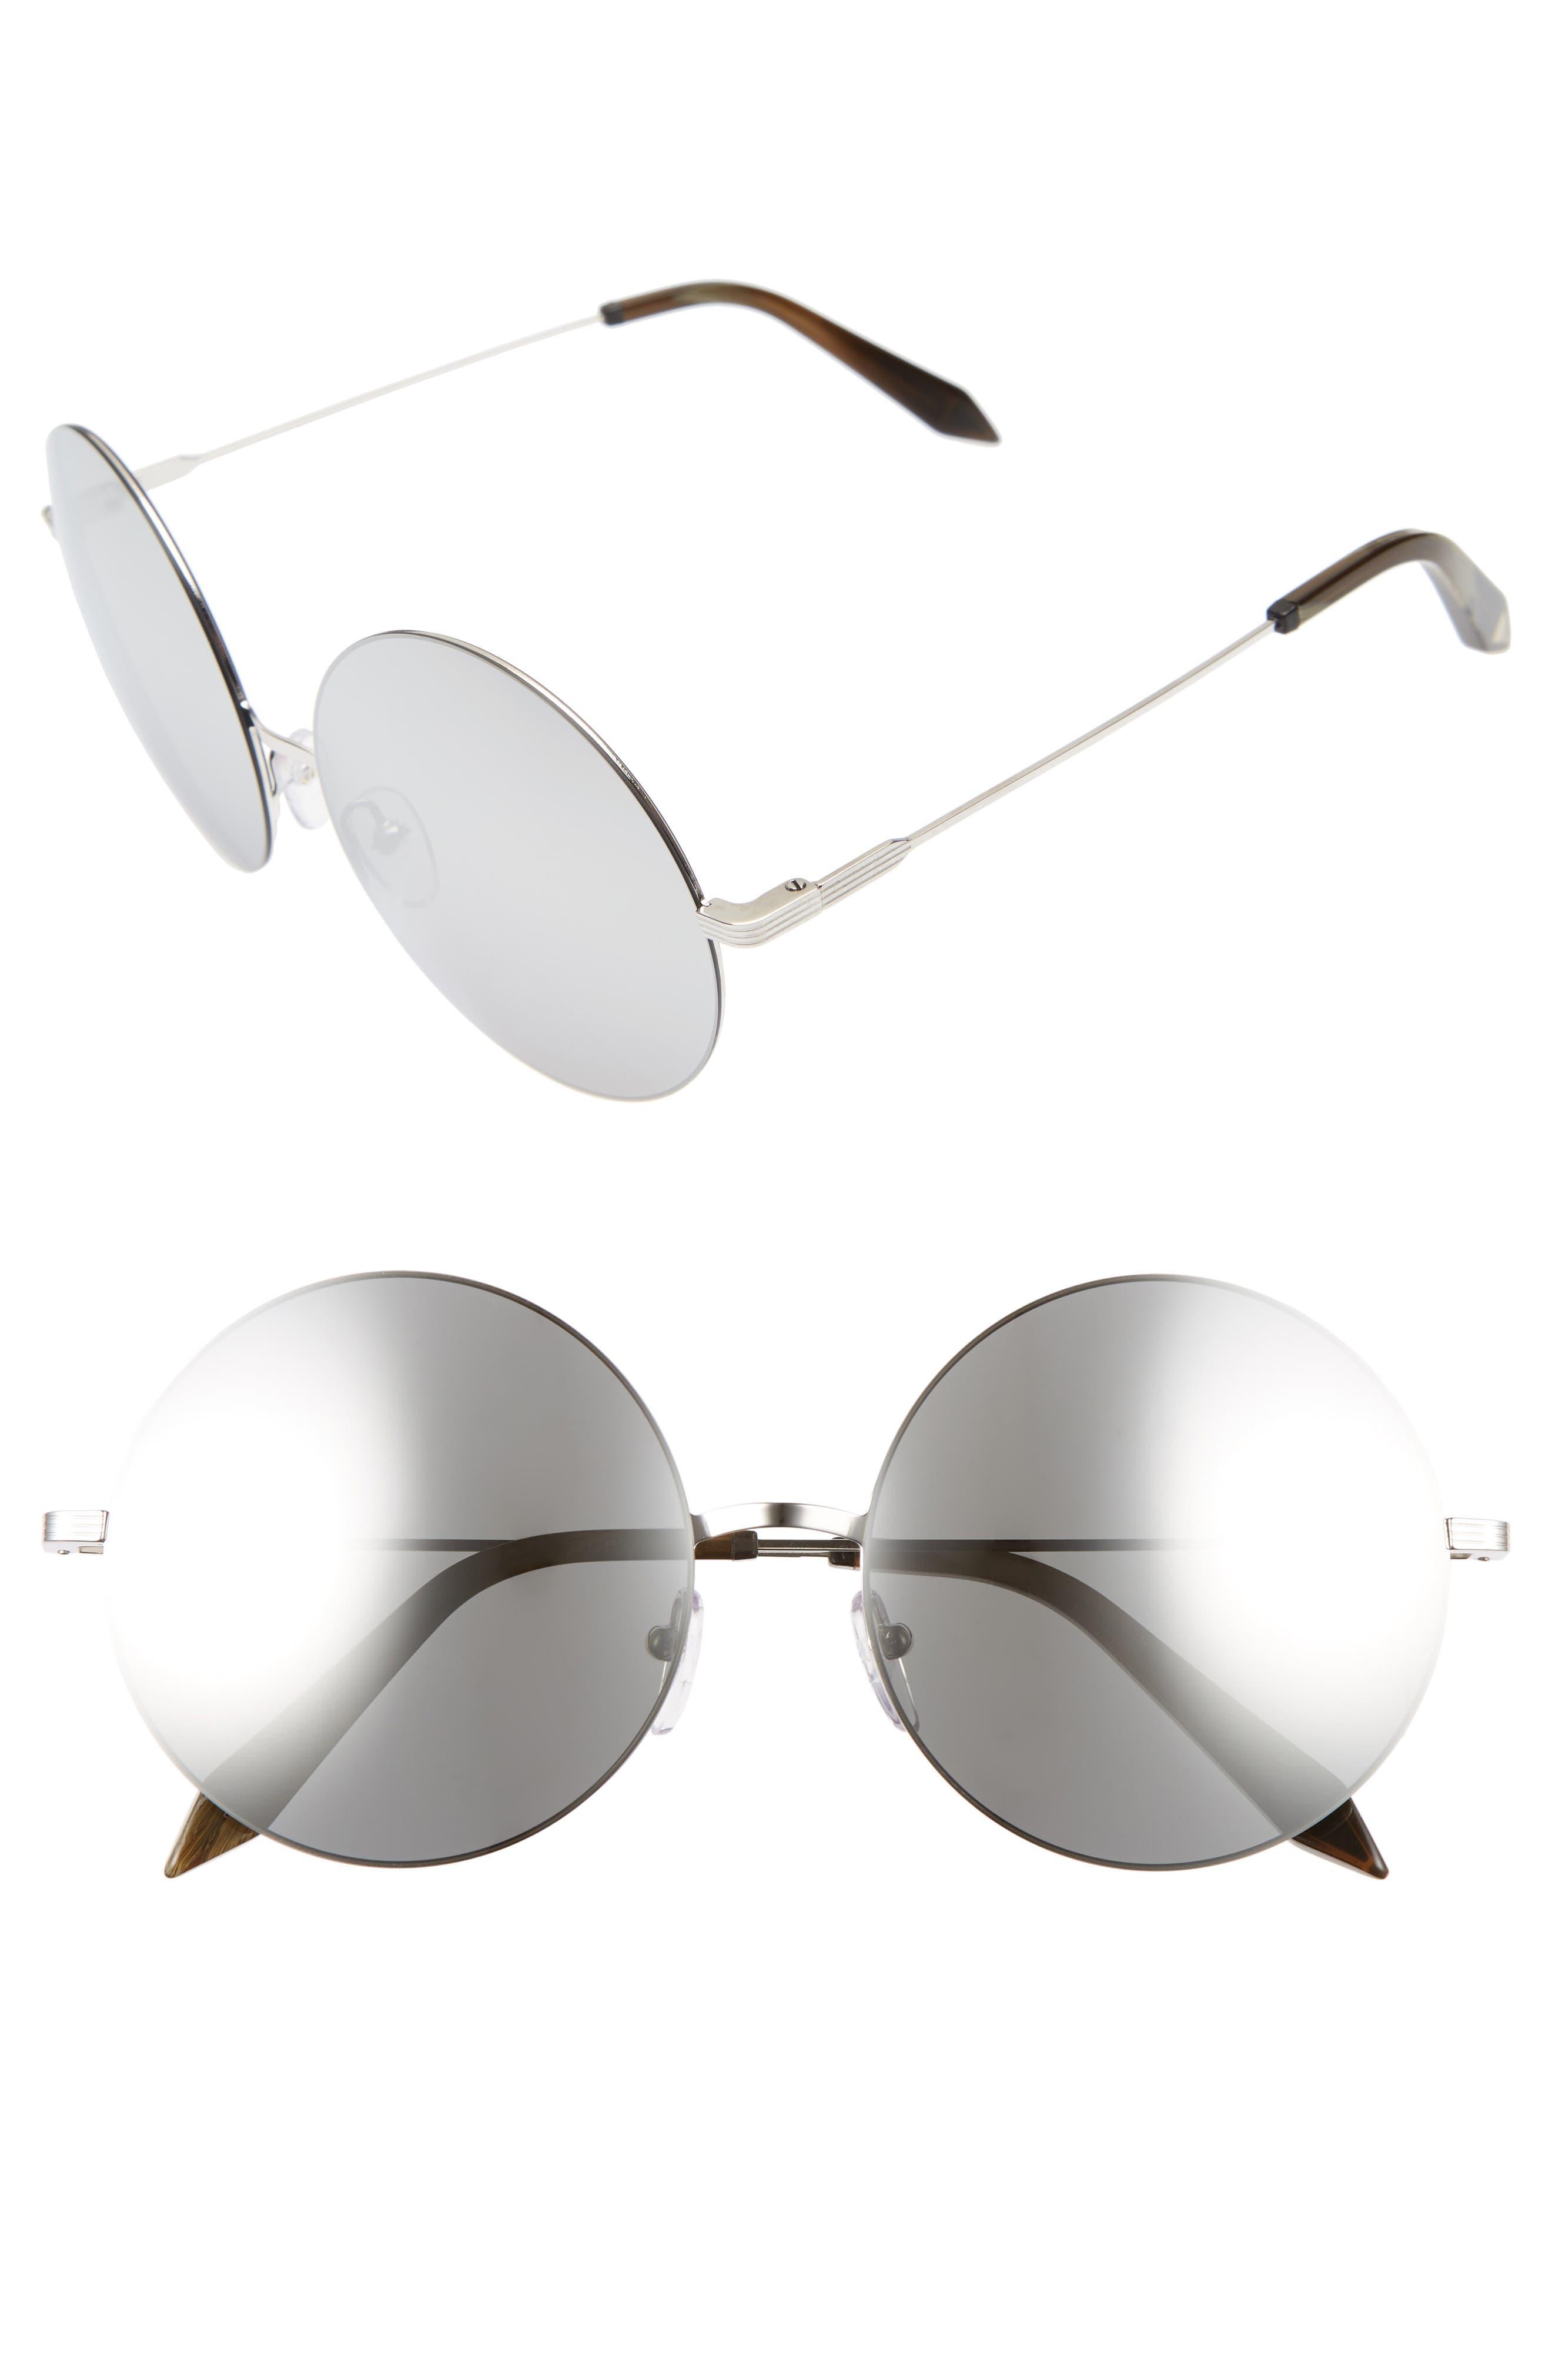 Main Image - Victoria Beckham Feather 58mm Round Sunglasses